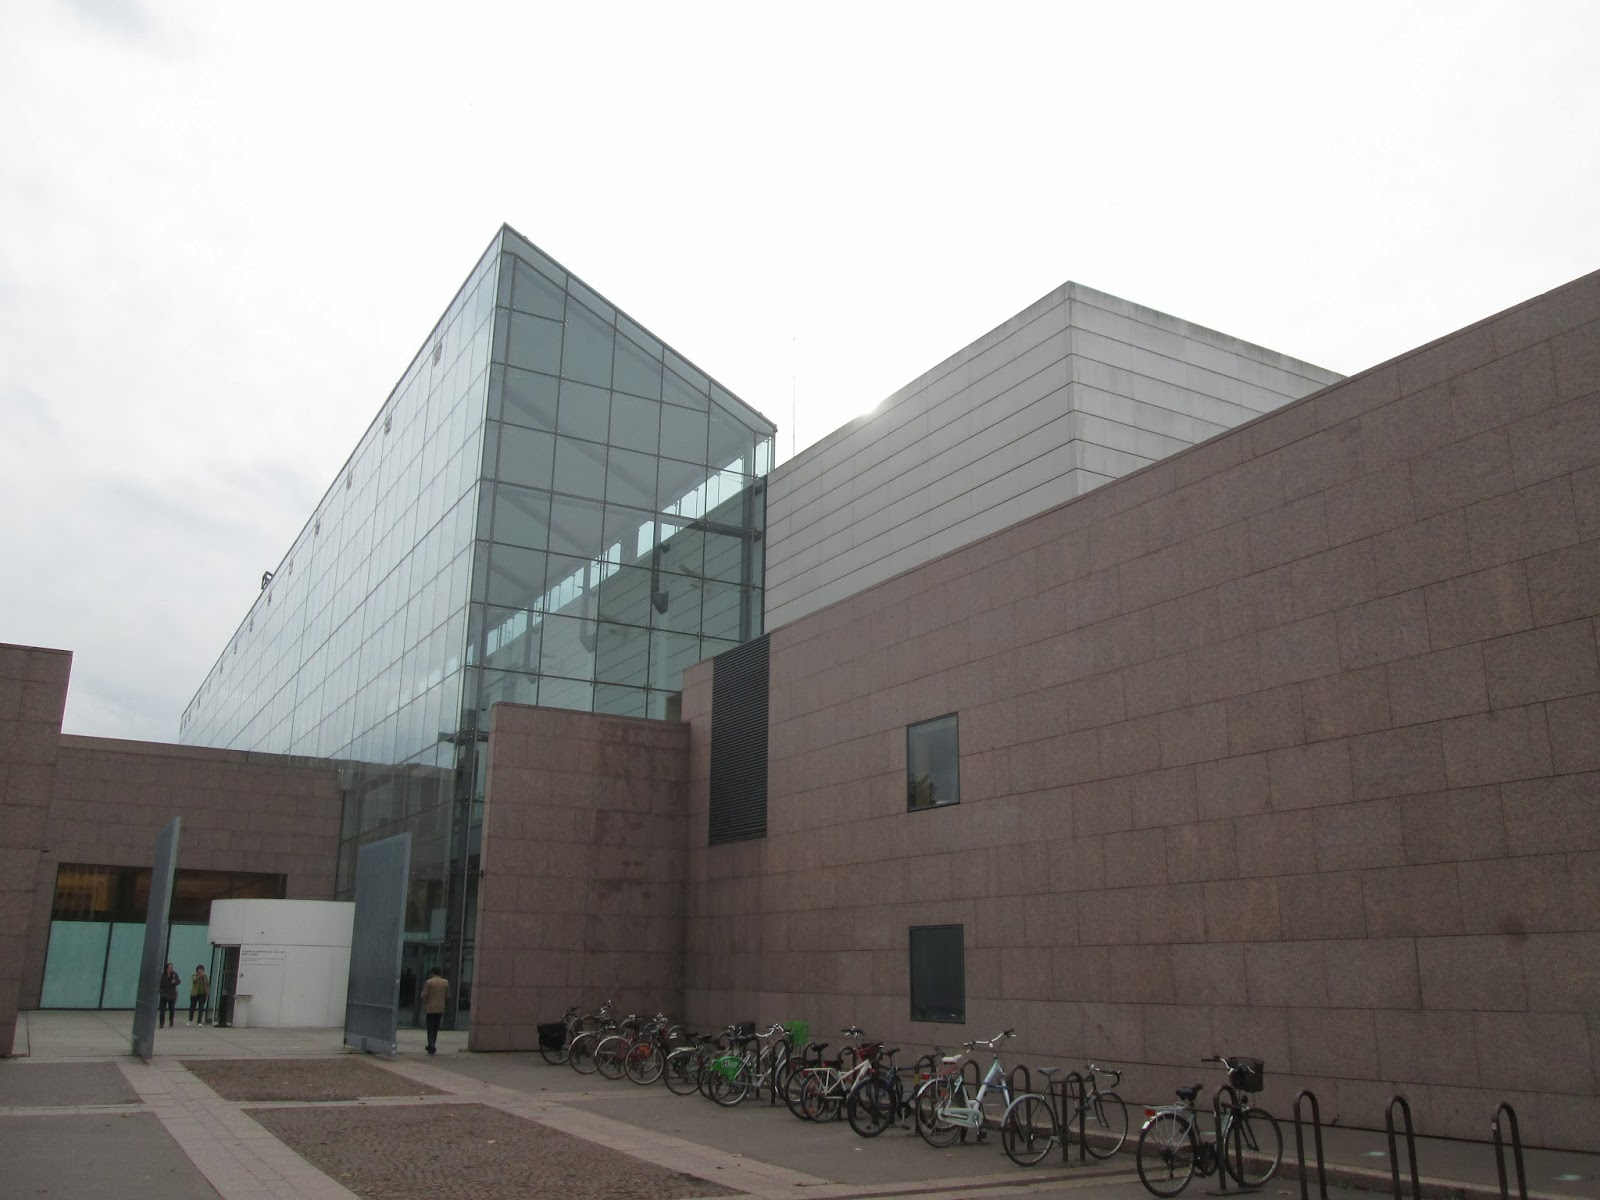 Entrevoir mus e d 39 art moderne et contemporain strasbourg for Art contemporain moderne